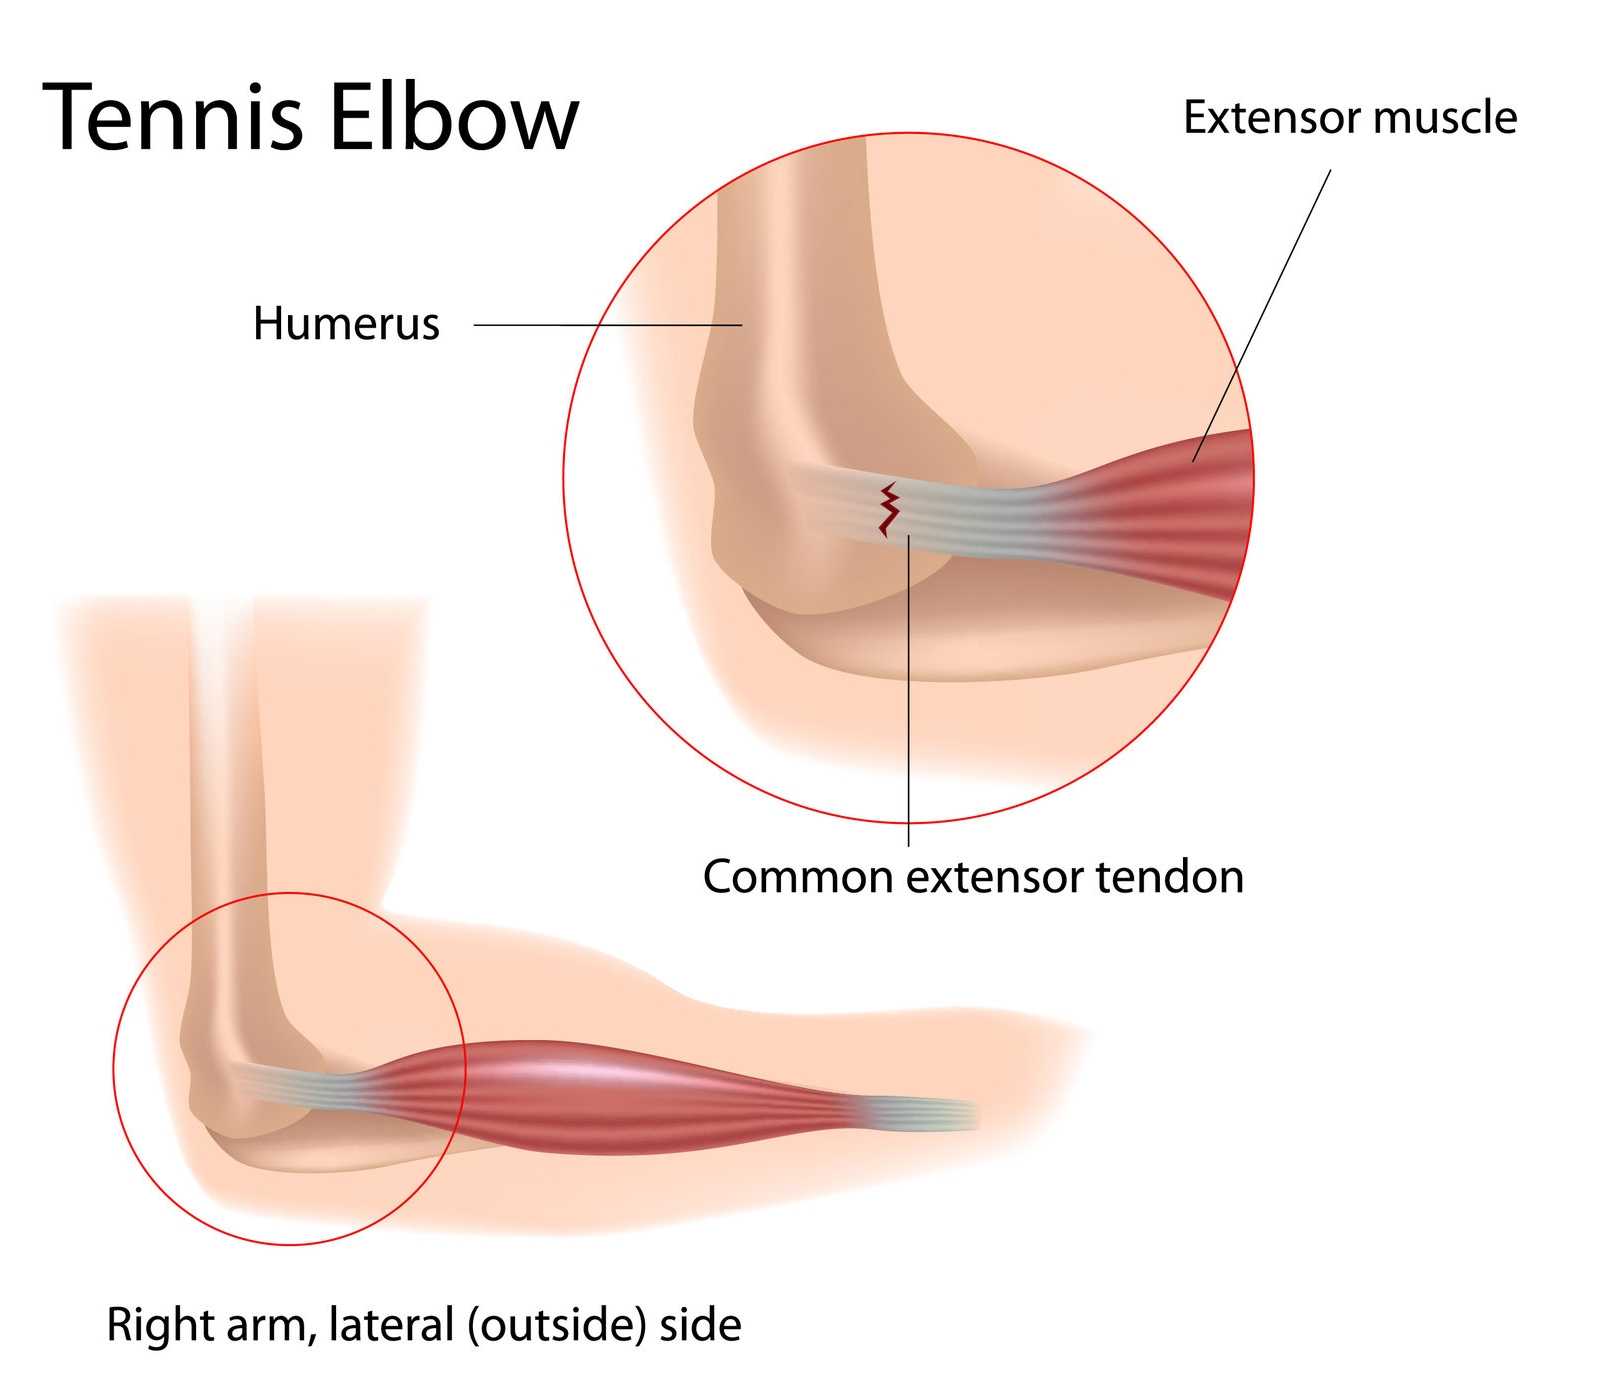 Tennis Elbow 7747404 (1).jpg